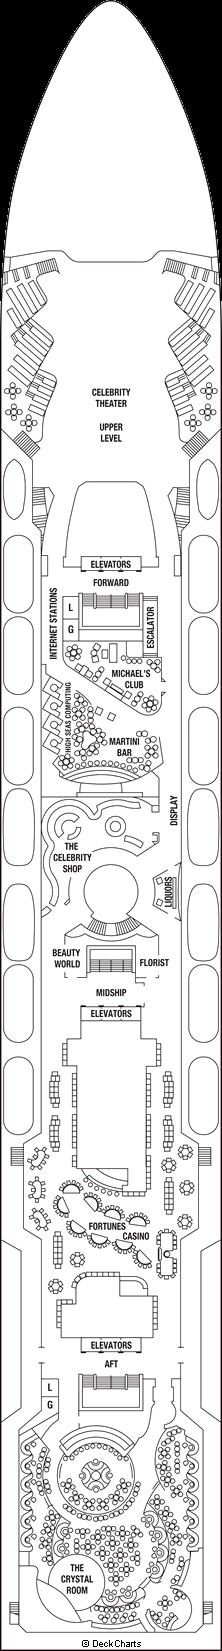 Celebrity Century: Deck 7